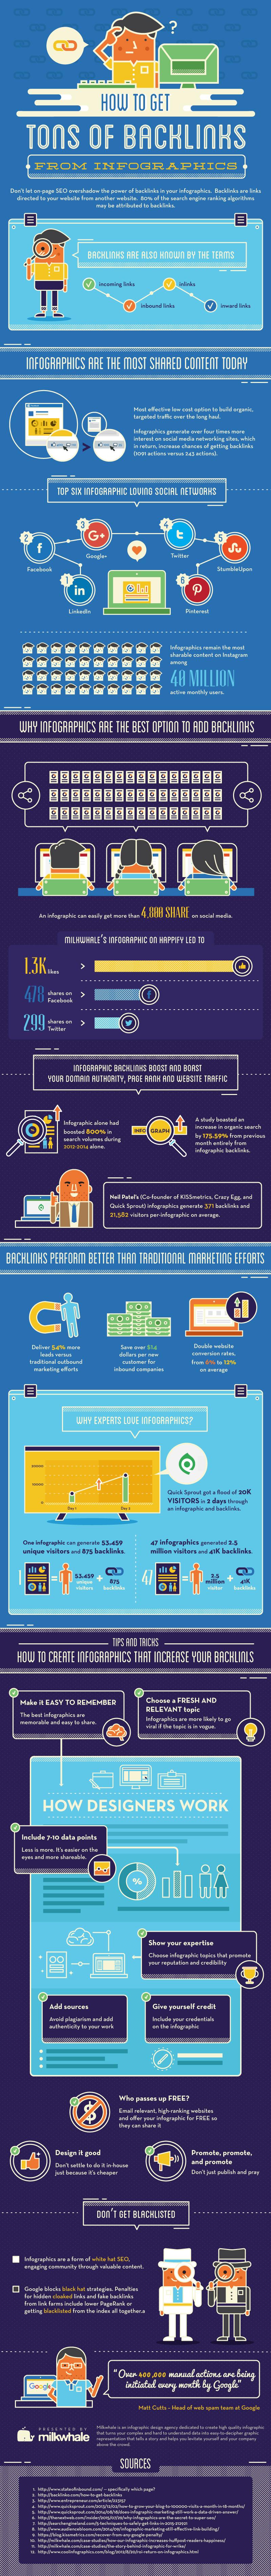 Cómo conseguir toneladas de backlinks con Infografías #infografia #marketing